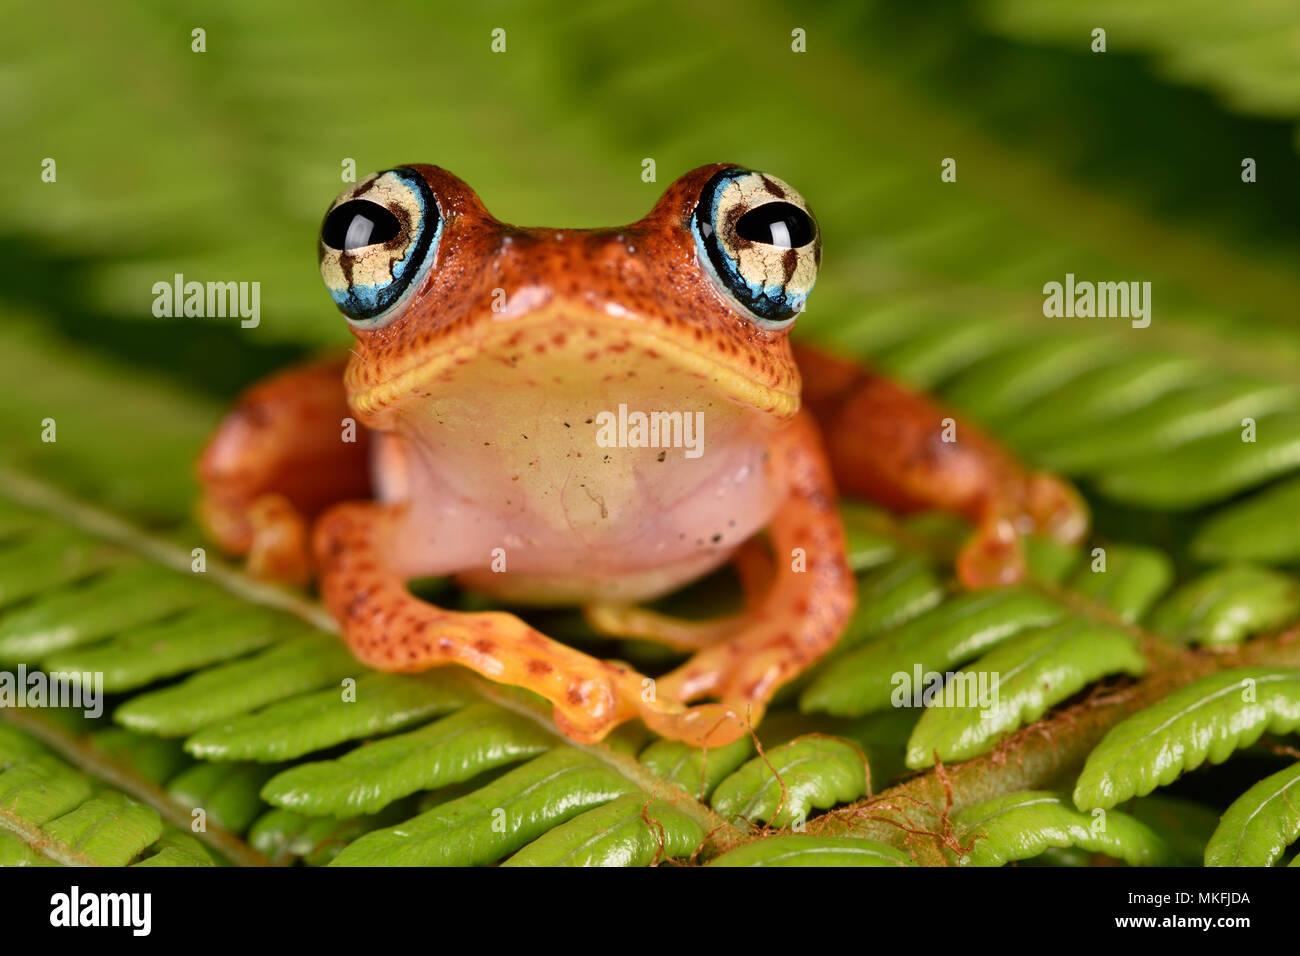 Fiery grenouille aux yeux brillants (Boophis pyrrhus), Andasibe, Perinet, Région Alaotra-Mangoro, Madagascar Photo Stock